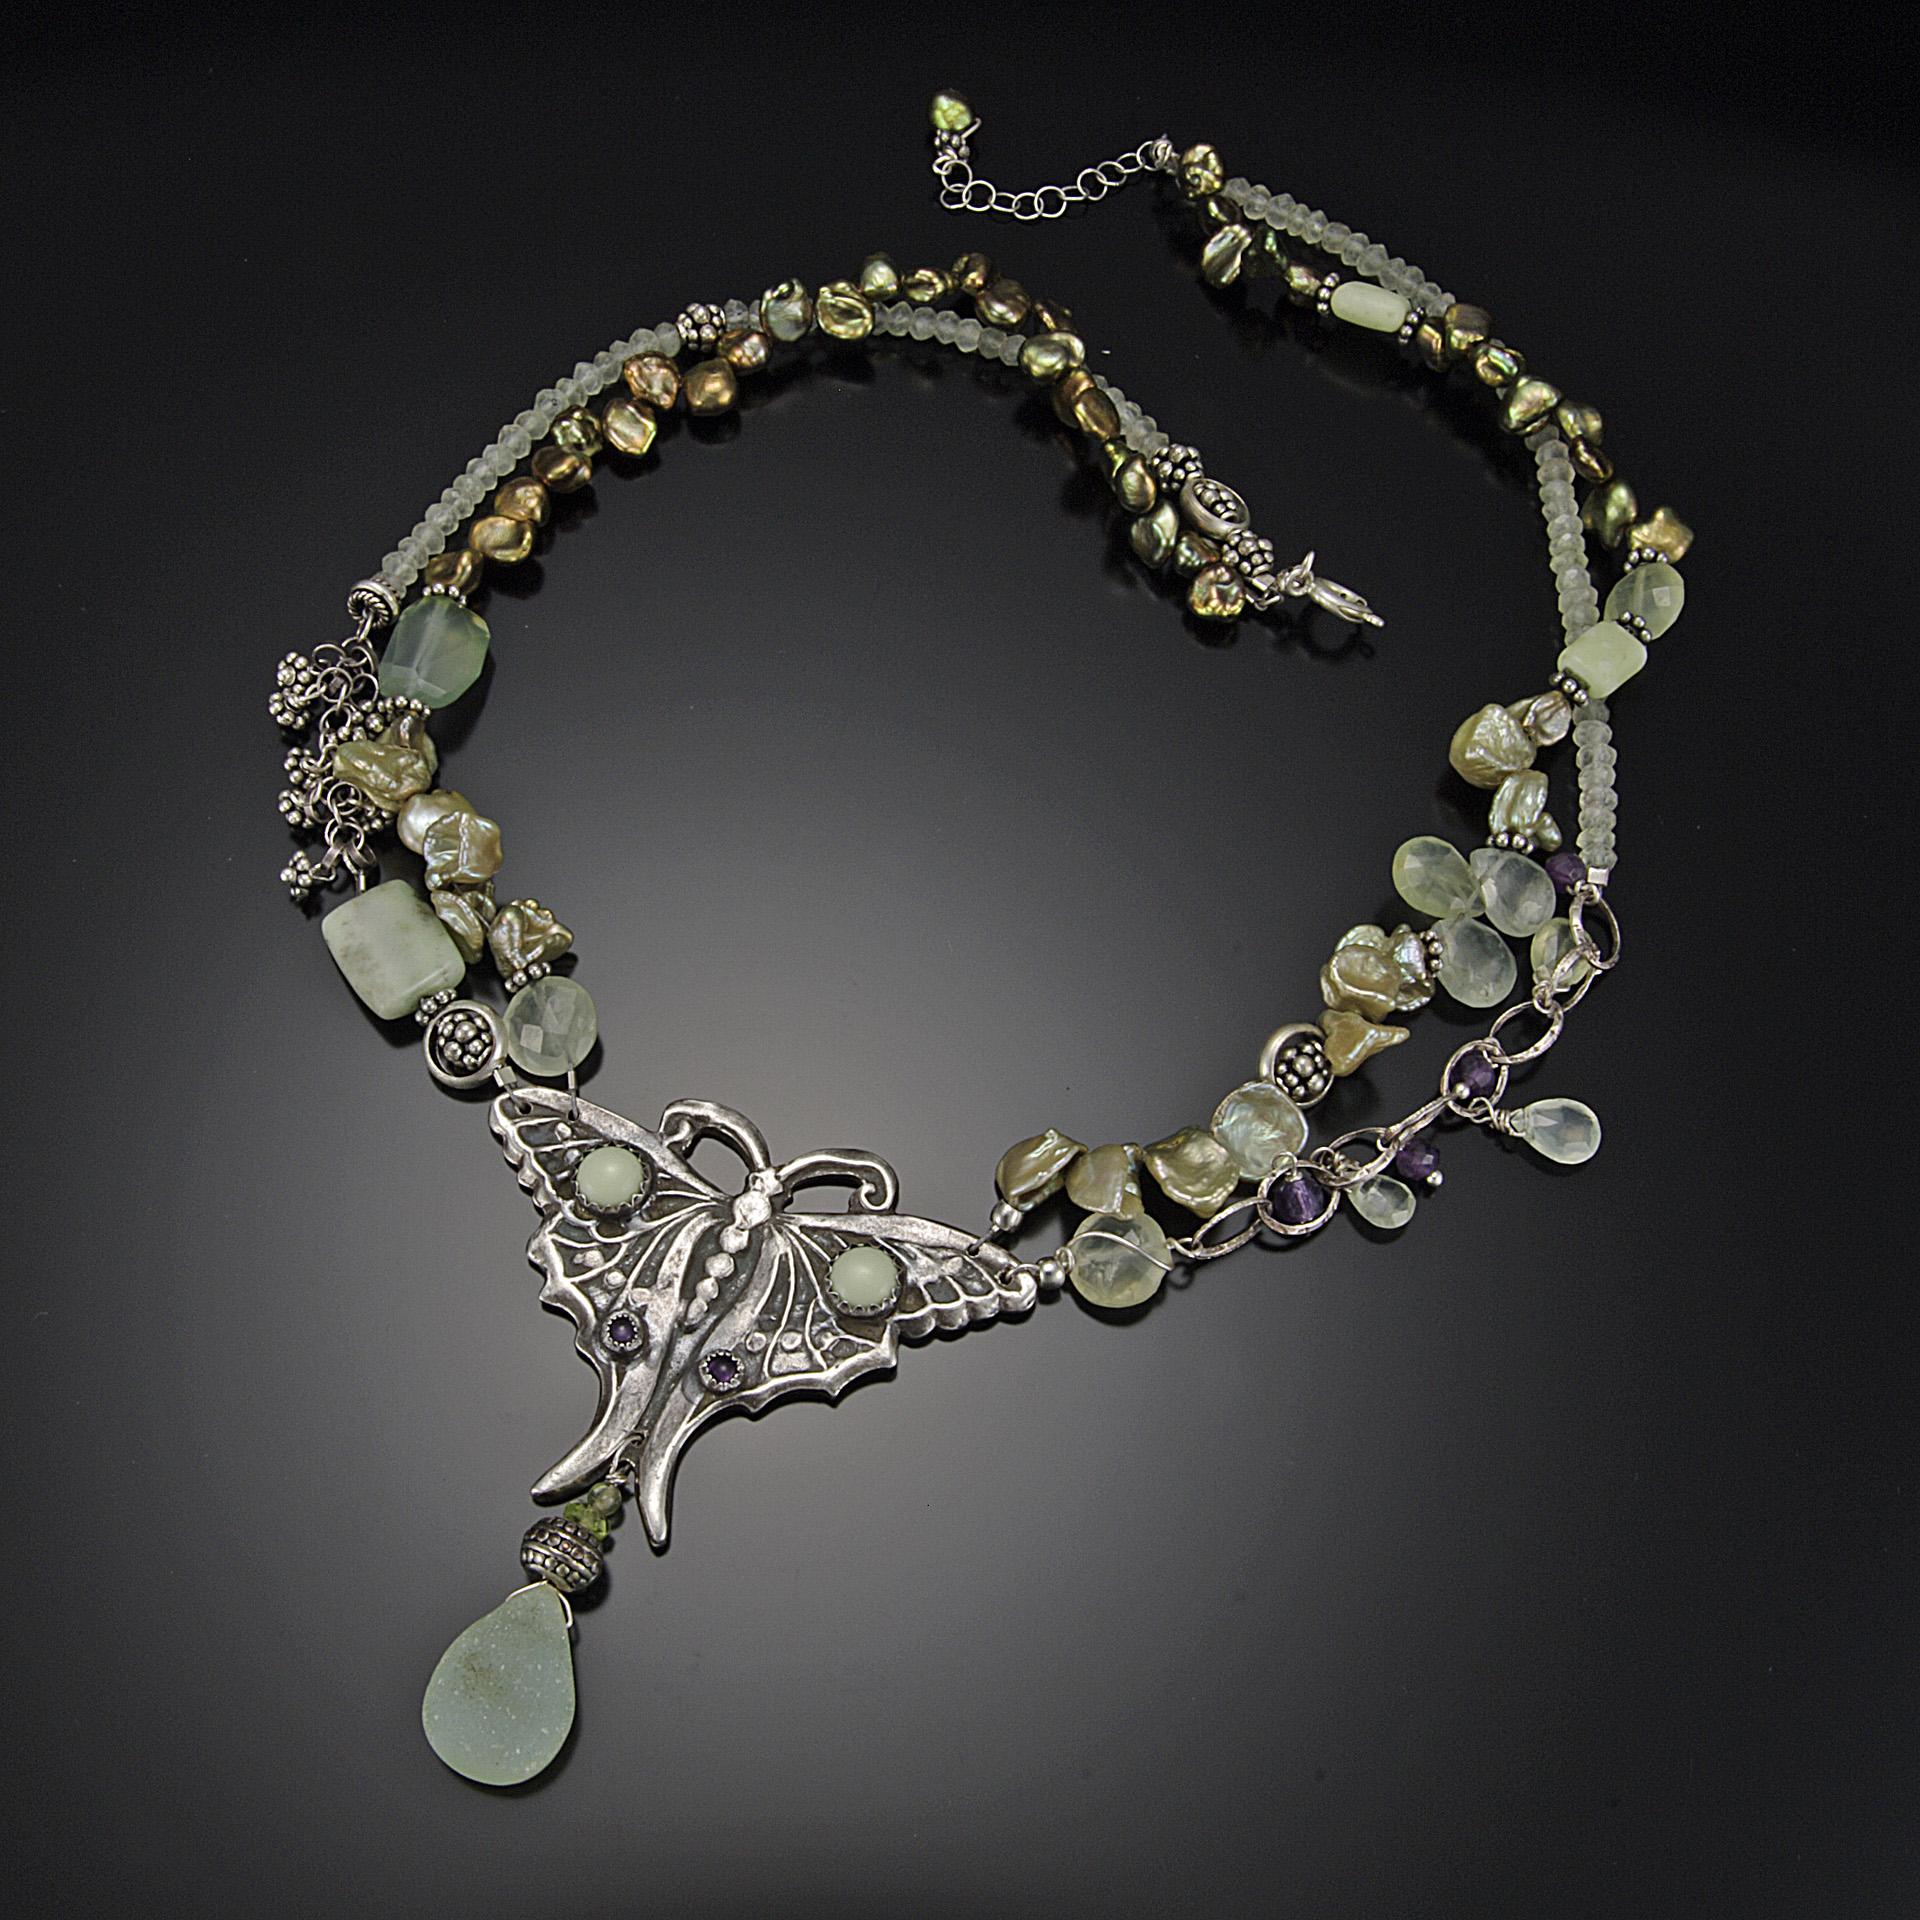 LUNA Moth Necklace; Fine Silver, Green Drusey, Prehnite, Peridot, Moonstone, Pearls, Amethyst; 2015